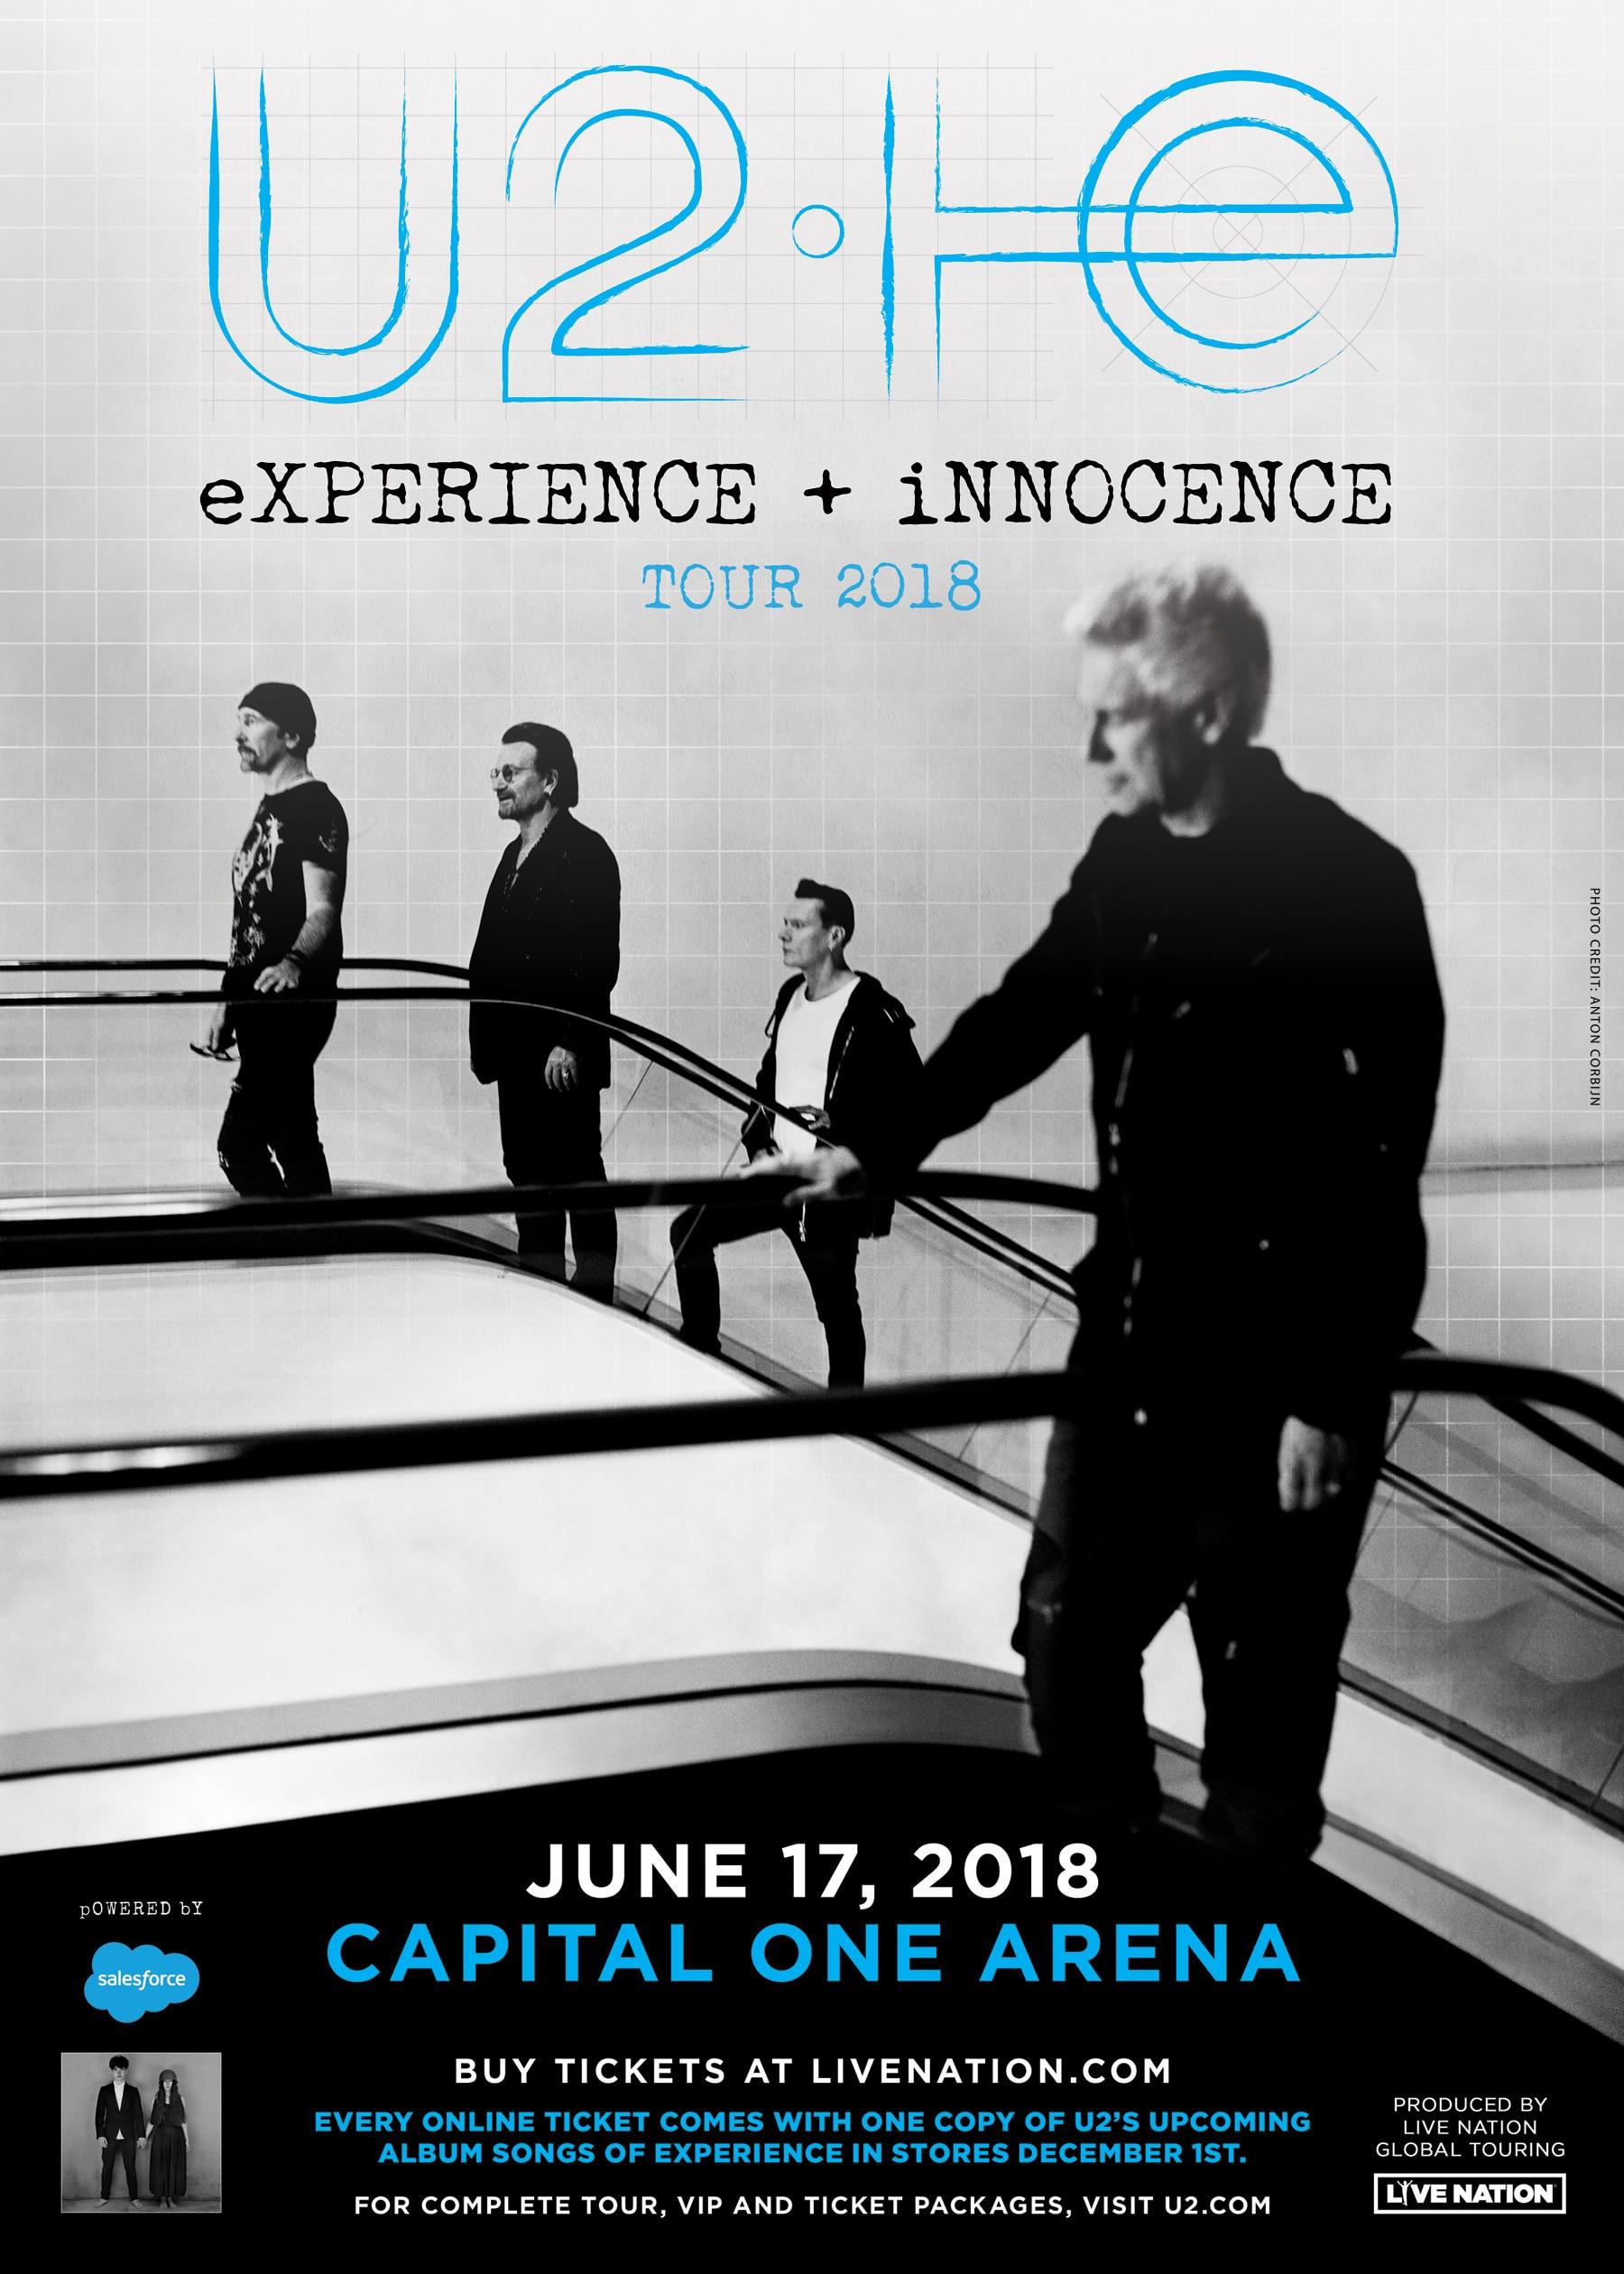 U2 The eXPERIENCE + iNNOCENCE Tour 2018 | Capital One Arena